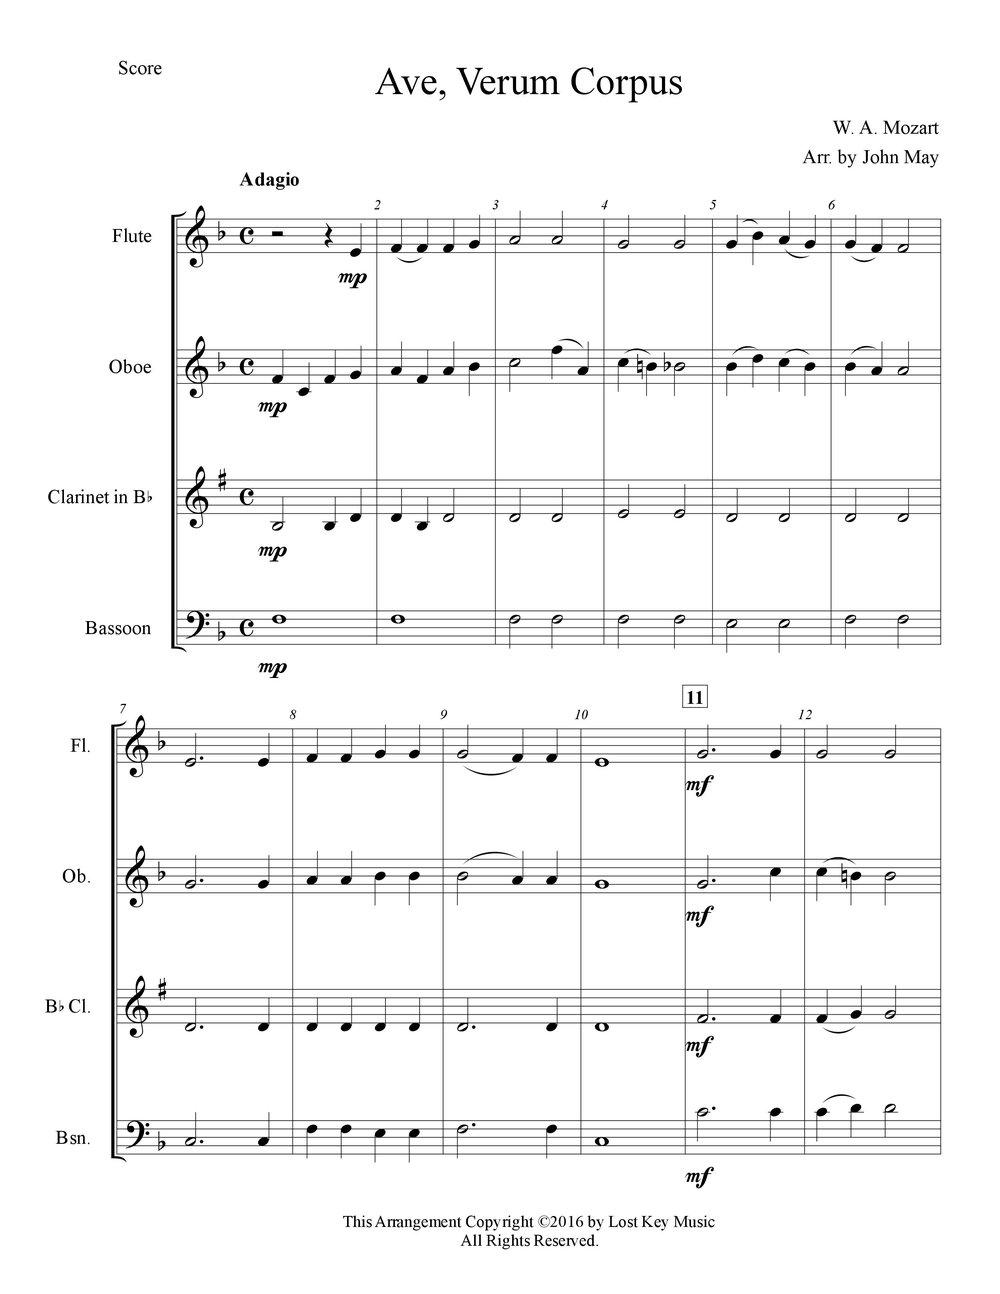 Ave, Verum Corpus Sample Score.jpg